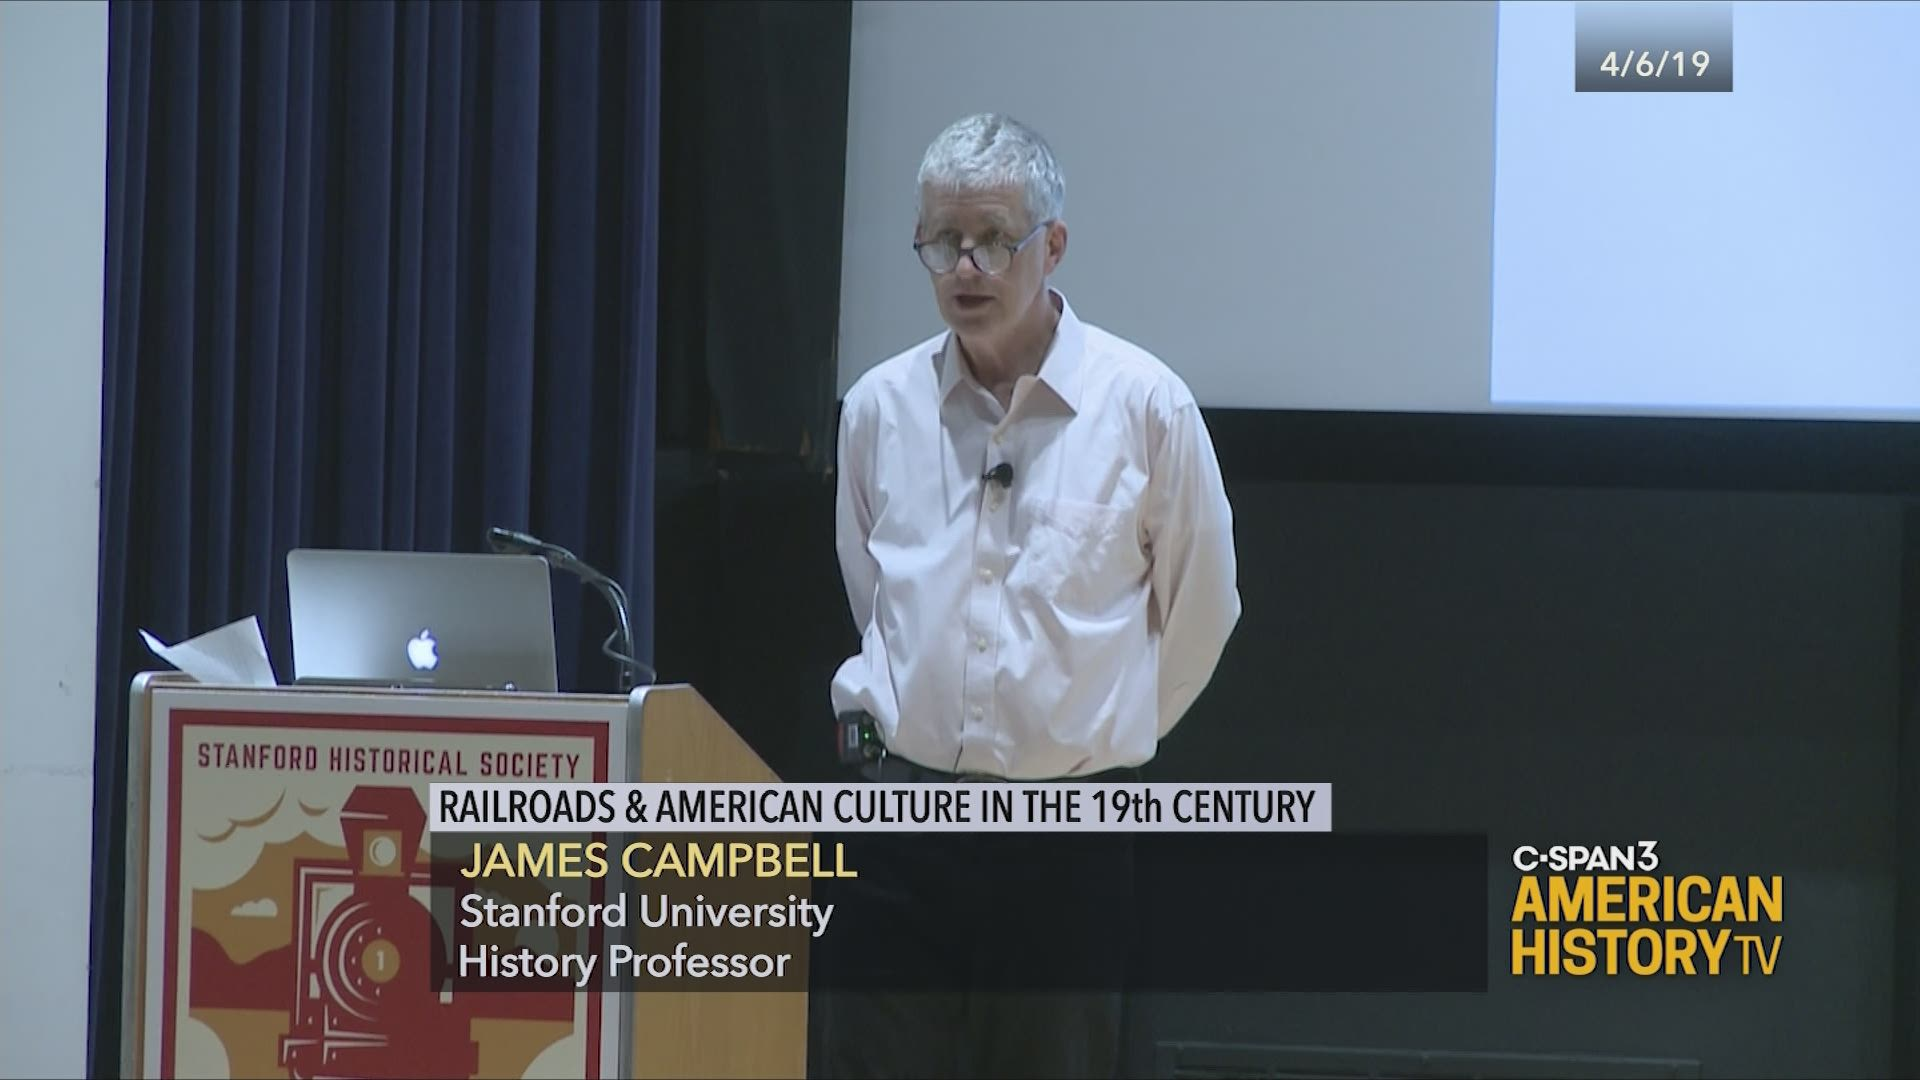 Railroads and American Culture in the 19th Century